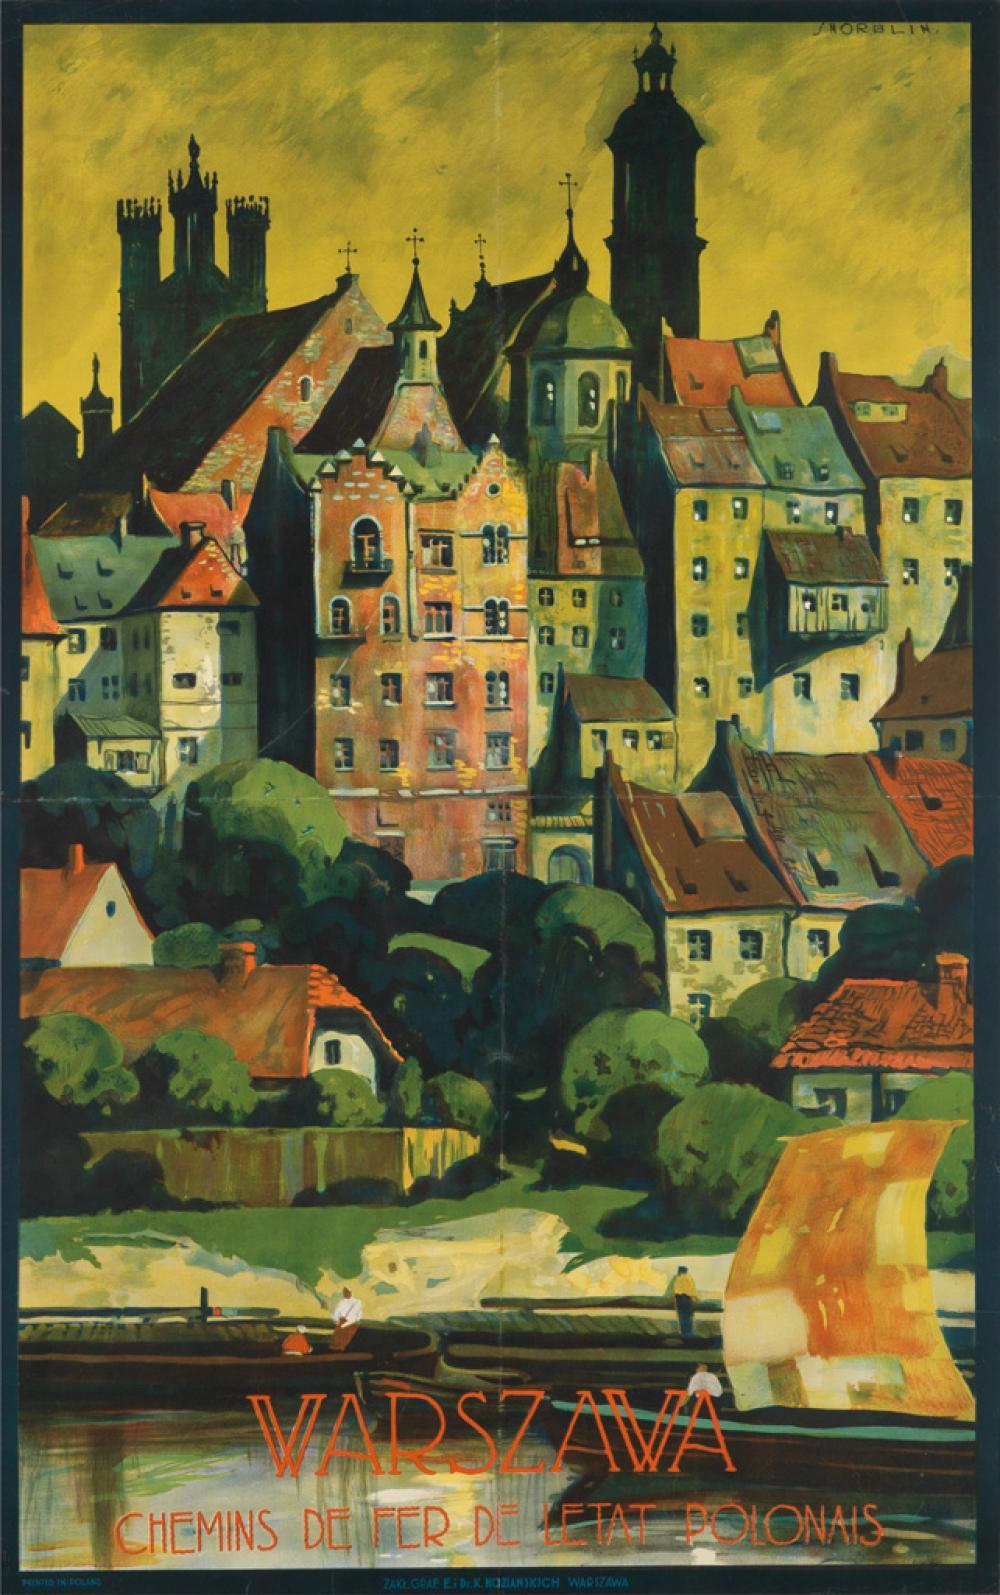 STEFAN NORBLIN (1892-1952). WARSZAWA. Circa 1925. 38x24 inches, 98x62 cm. K. Kozianskich, Warsaw.